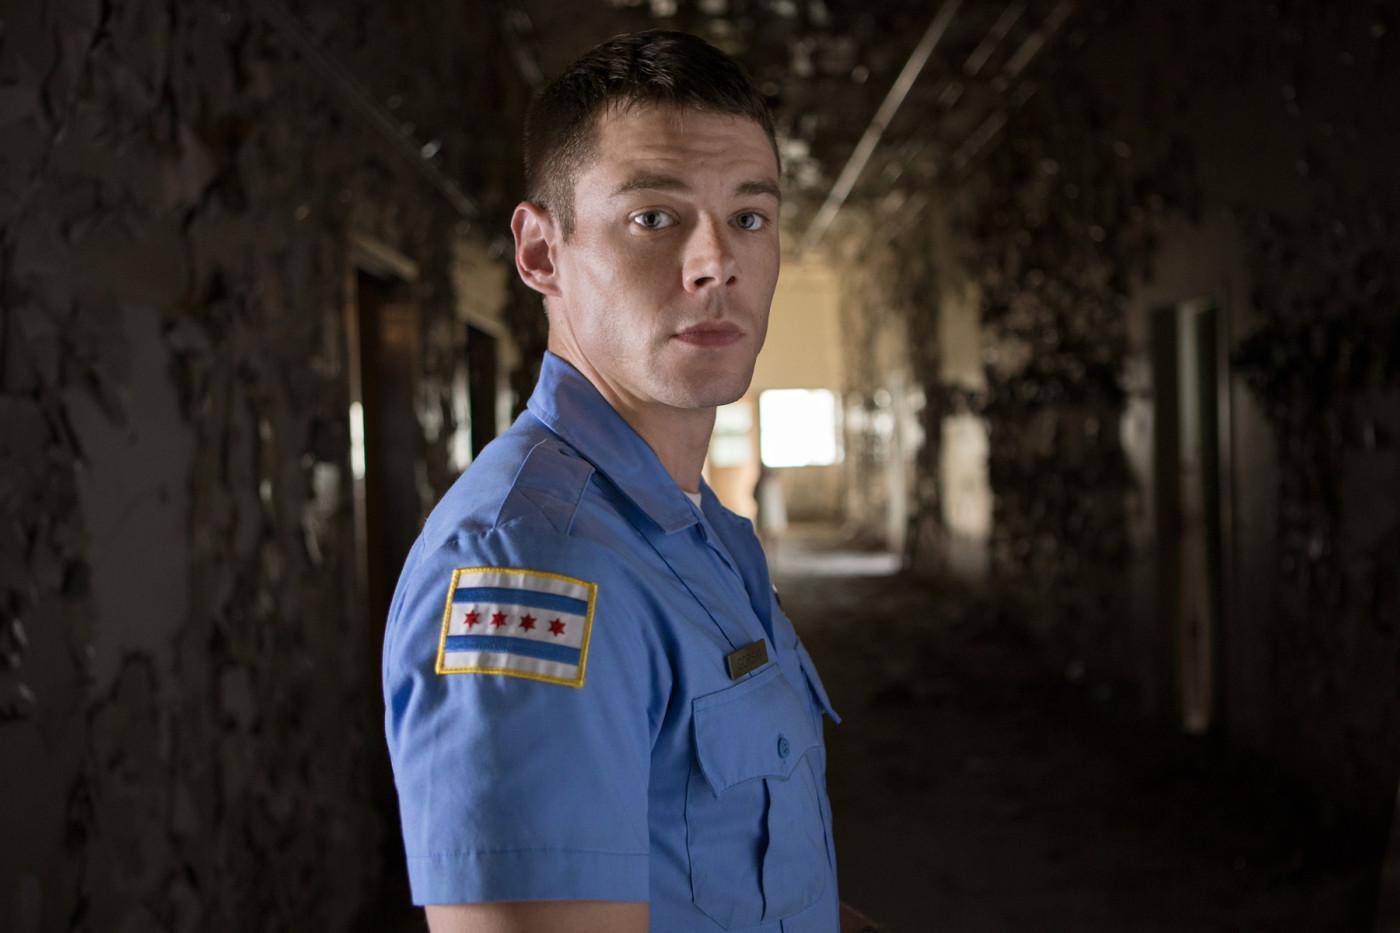 Sense8 Stars Speculate On Season 2 TV Show Patrol